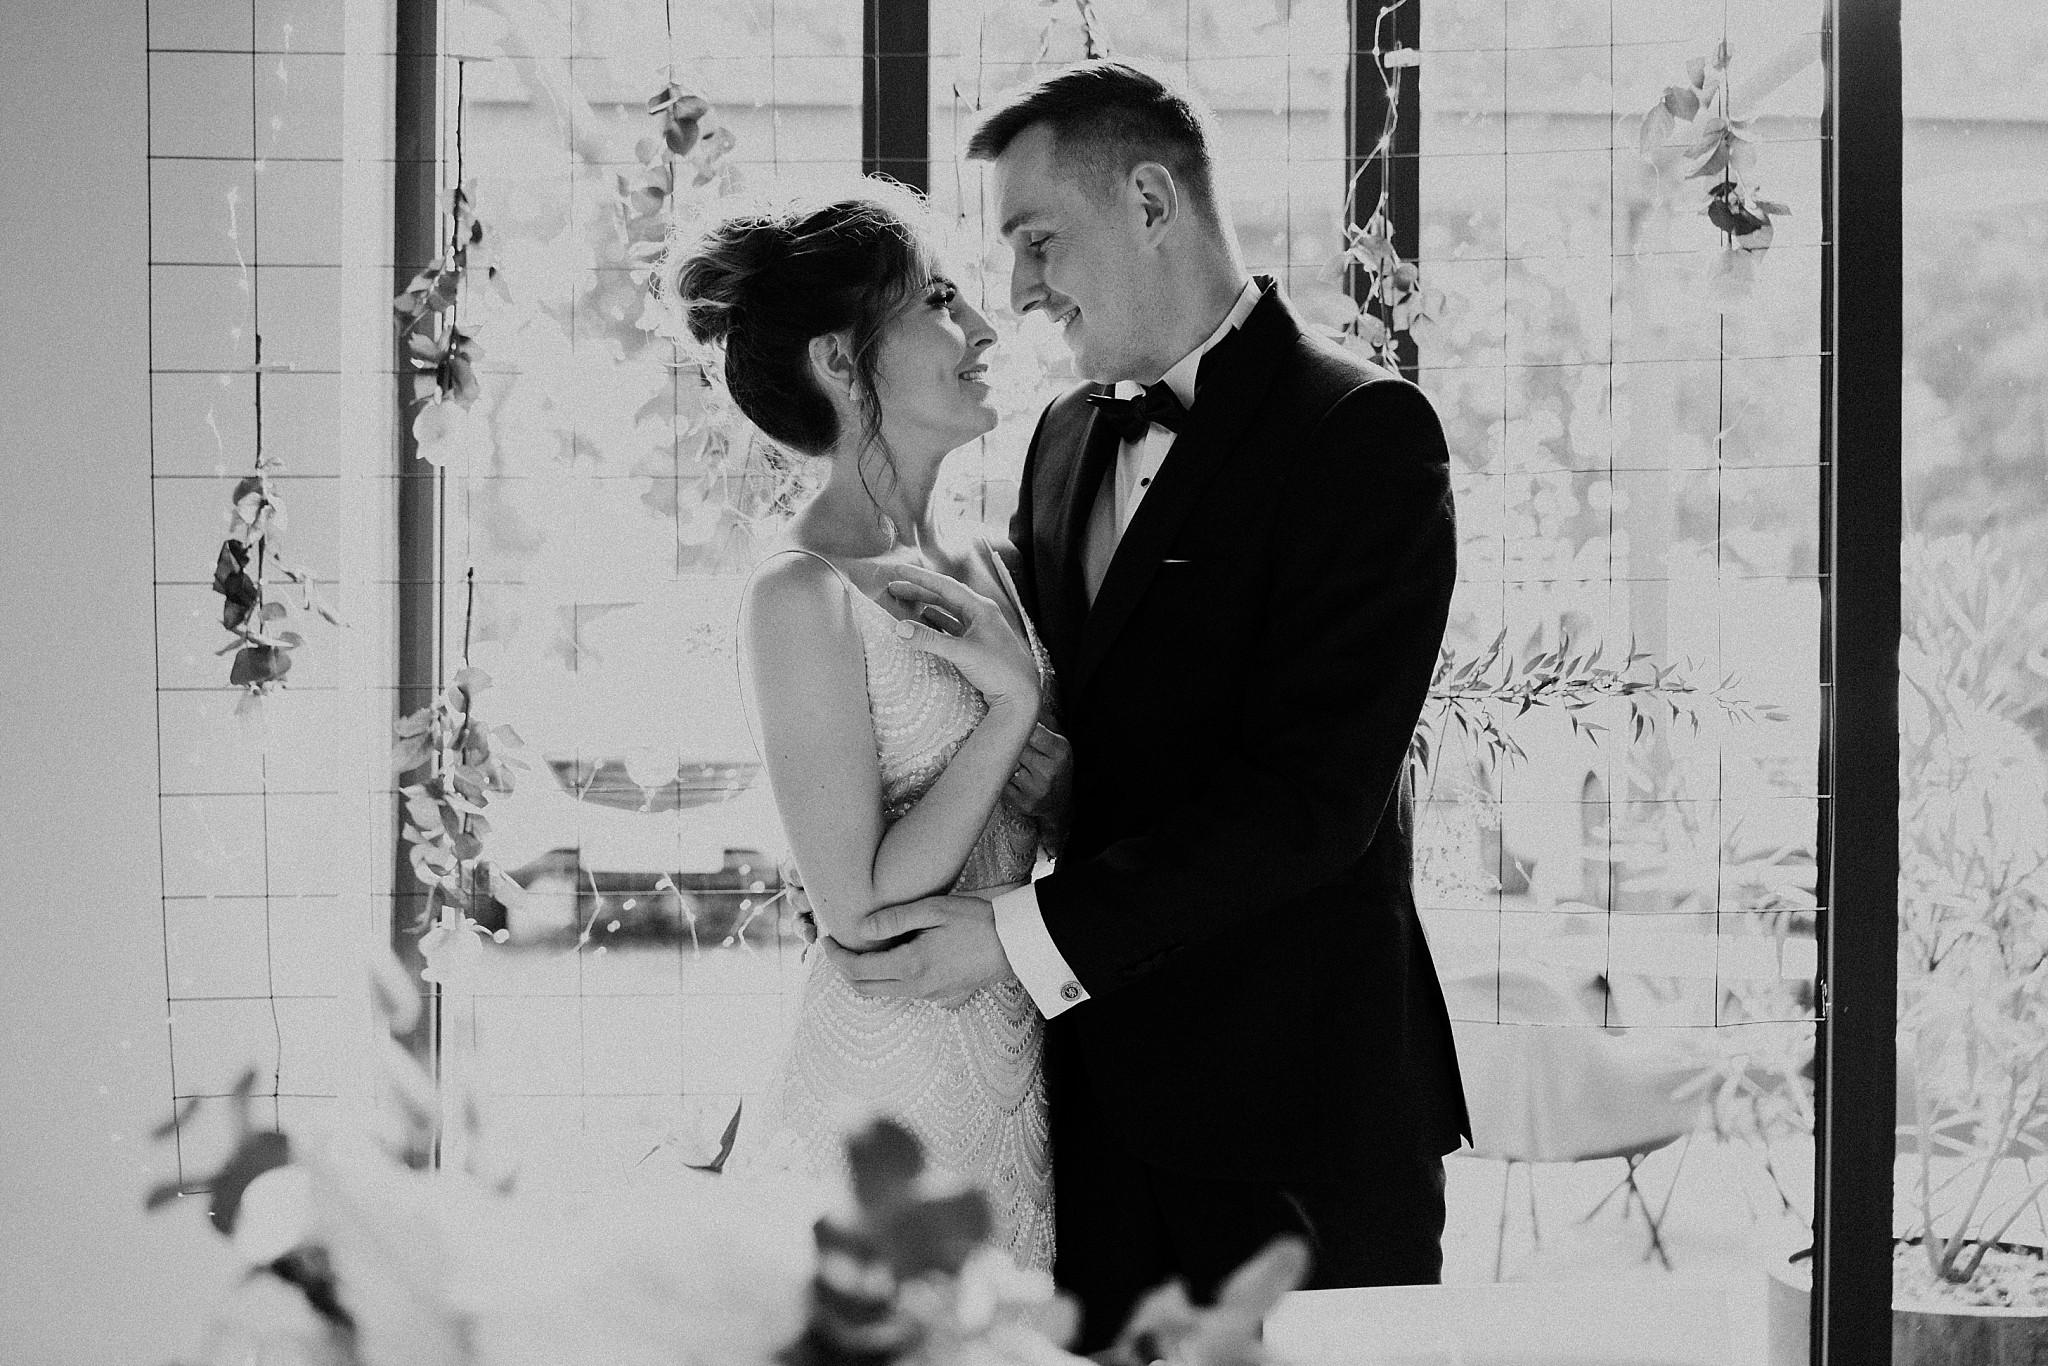 fotograf poznan wesele dobra truskawka piekne wesele pod poznaniem wesele w dobrej truskawce piekna para mloda slub marzen slub koronawirus slub listopad wesele koronawirus 302